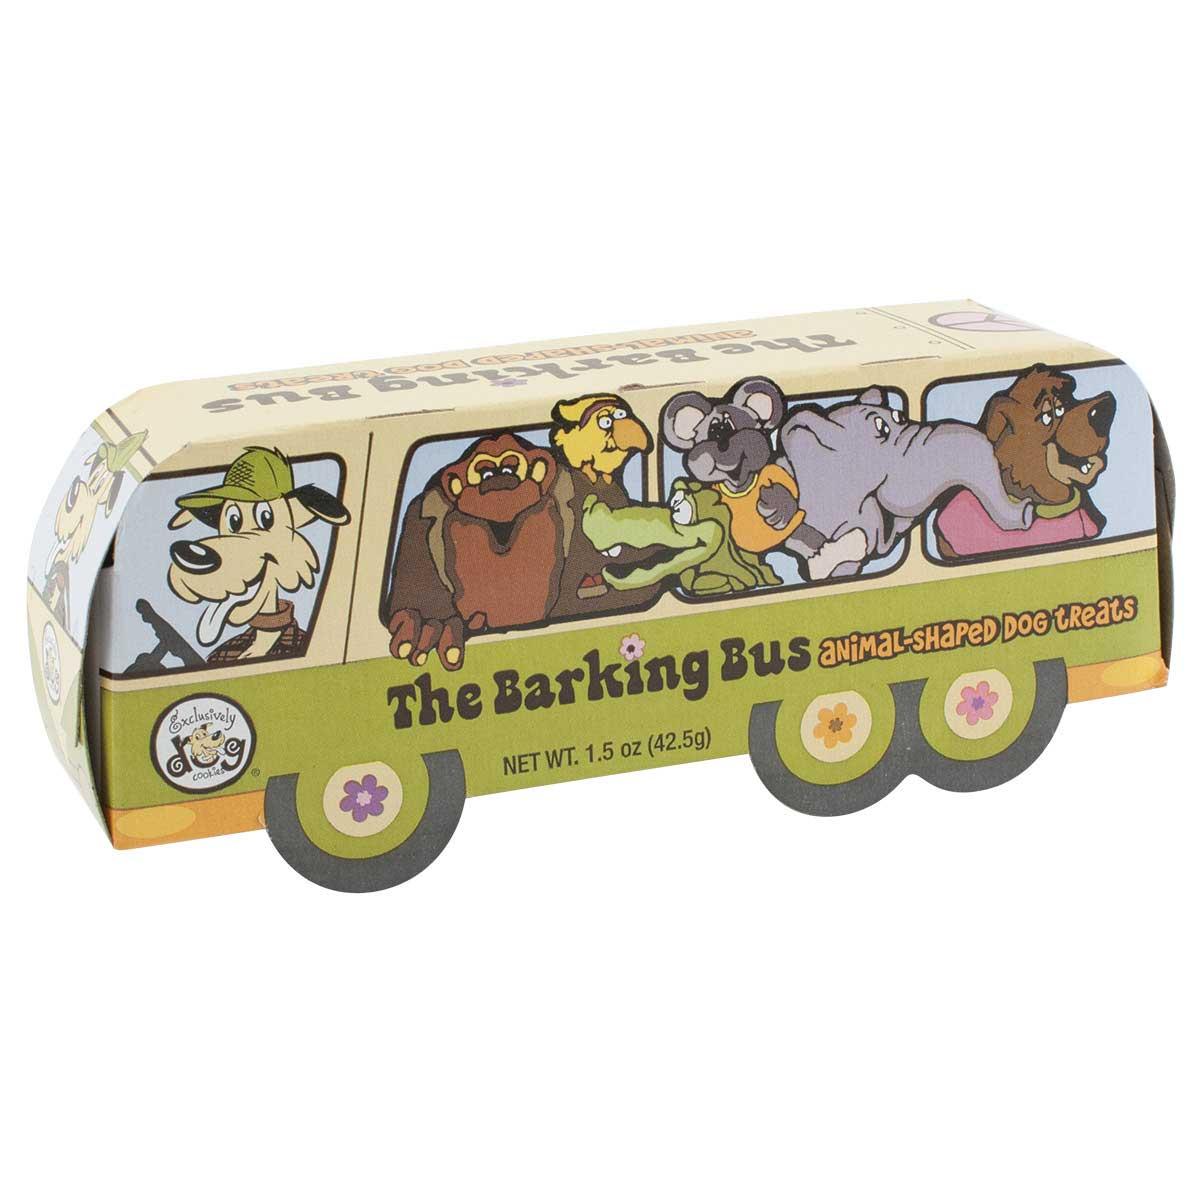 Exclusively Dog Barking Bus Animal Cookies Dog Treats 1.5 oz